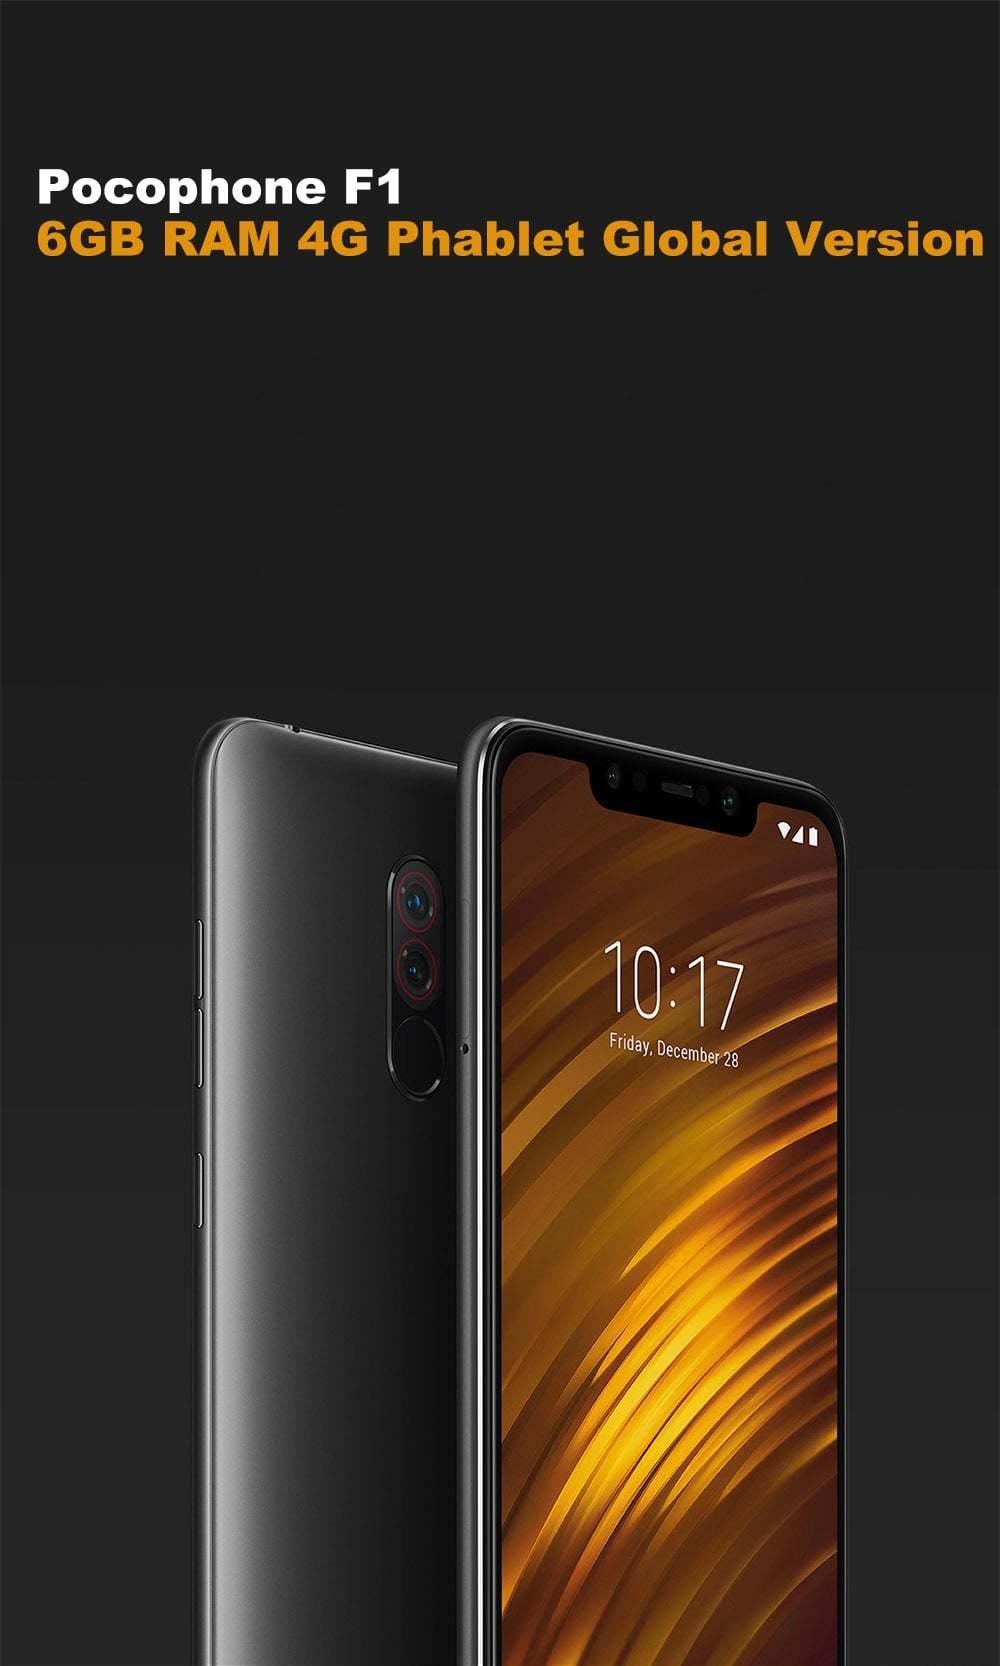 Xiaomi Pocophone F1 4G phablet 6,18 pouces Android 8.1 Snapdragon 845 Octa base 2.8GHz 6GB RAM 128Go ROM 20.0MP Caméra avant d'empreintes digitales noir graphite 6 Sensor + 128Go